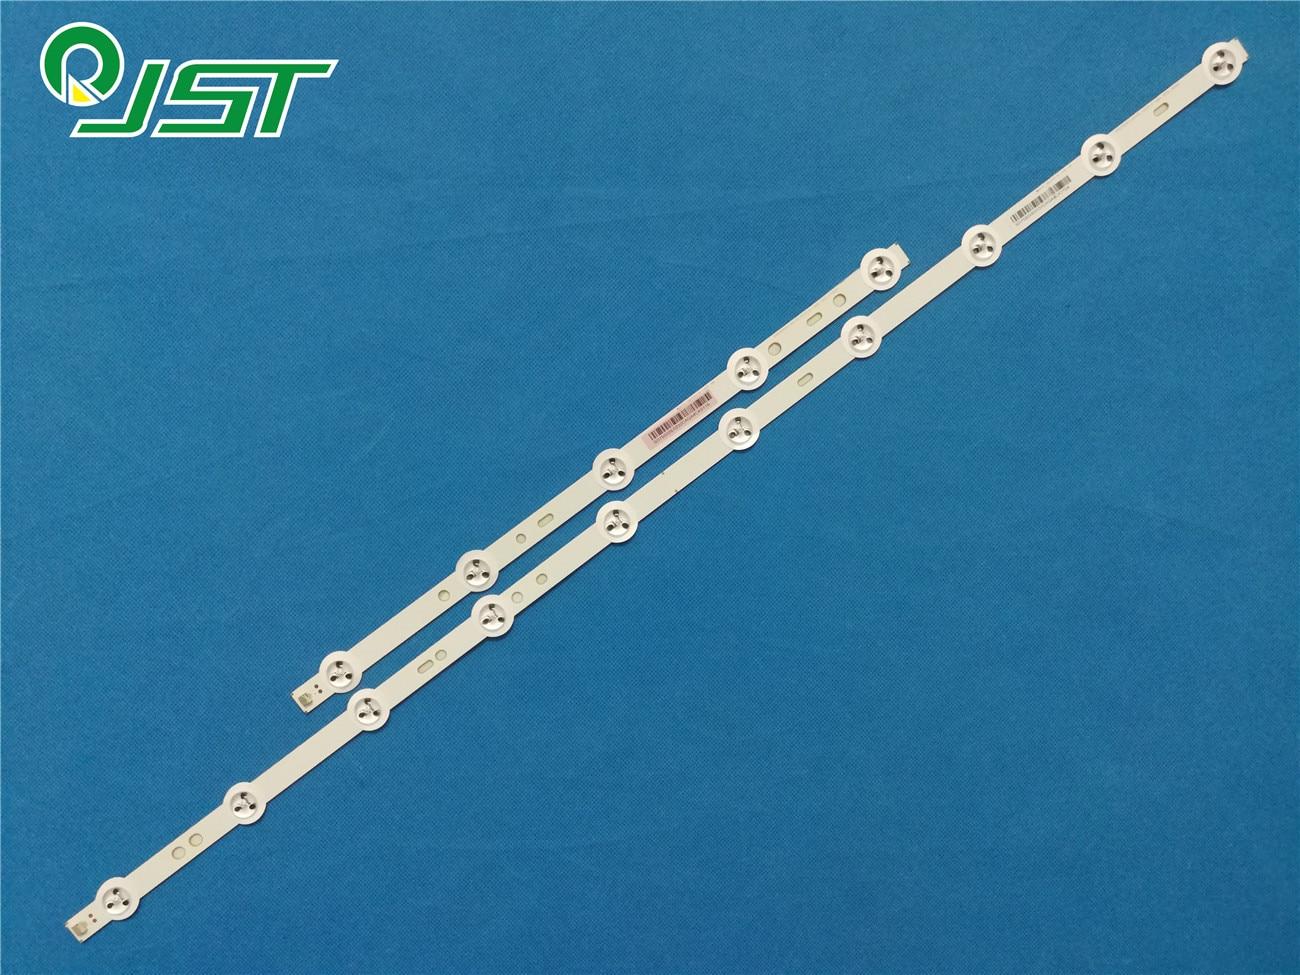 100% New 1pcs B type LED strip for SO NY 75 TV XBR 75X850E KD 75X8500C XBR 75X850C 96.75S02.201 SVA750A03 Rev04 5LED B Type 3528